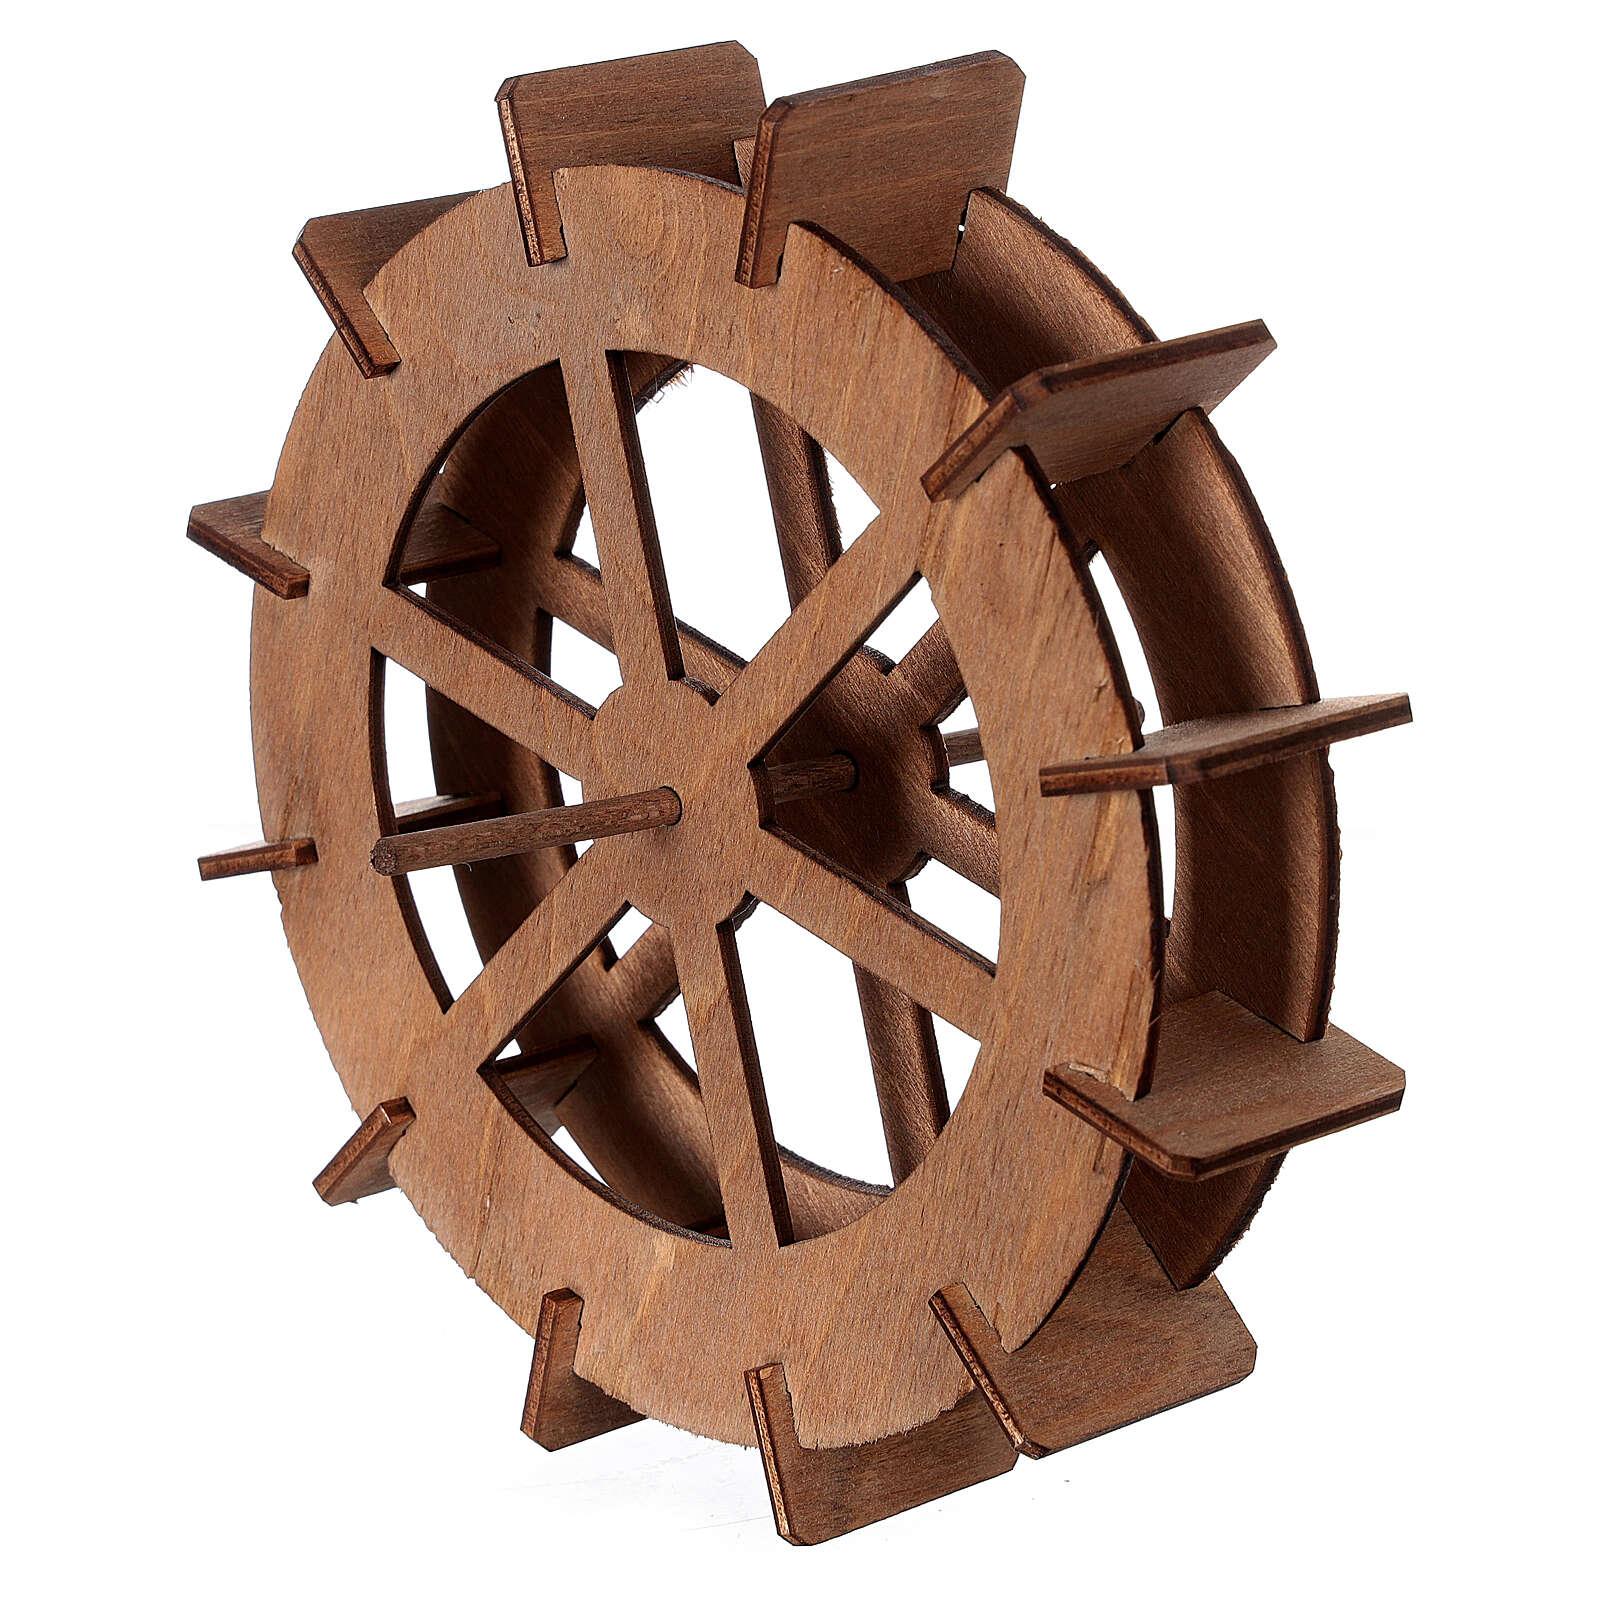 Miniature mill wheel in wood 15 cm diameter 4